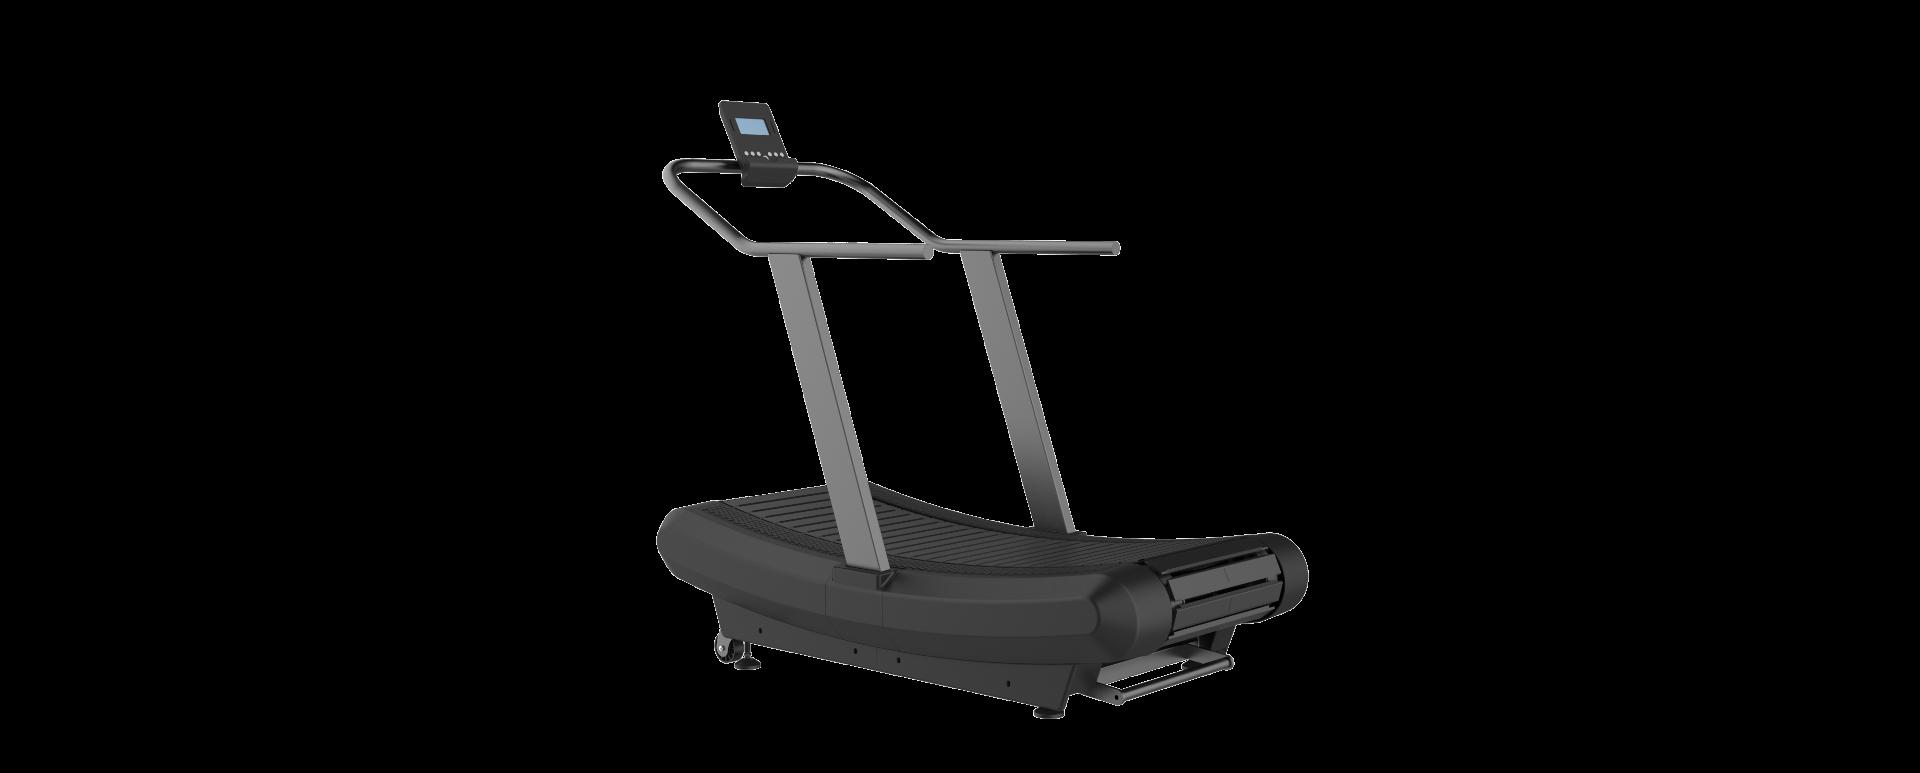 Tricore - Fitness and Gym Equipment in Kottakkal, Malappuram